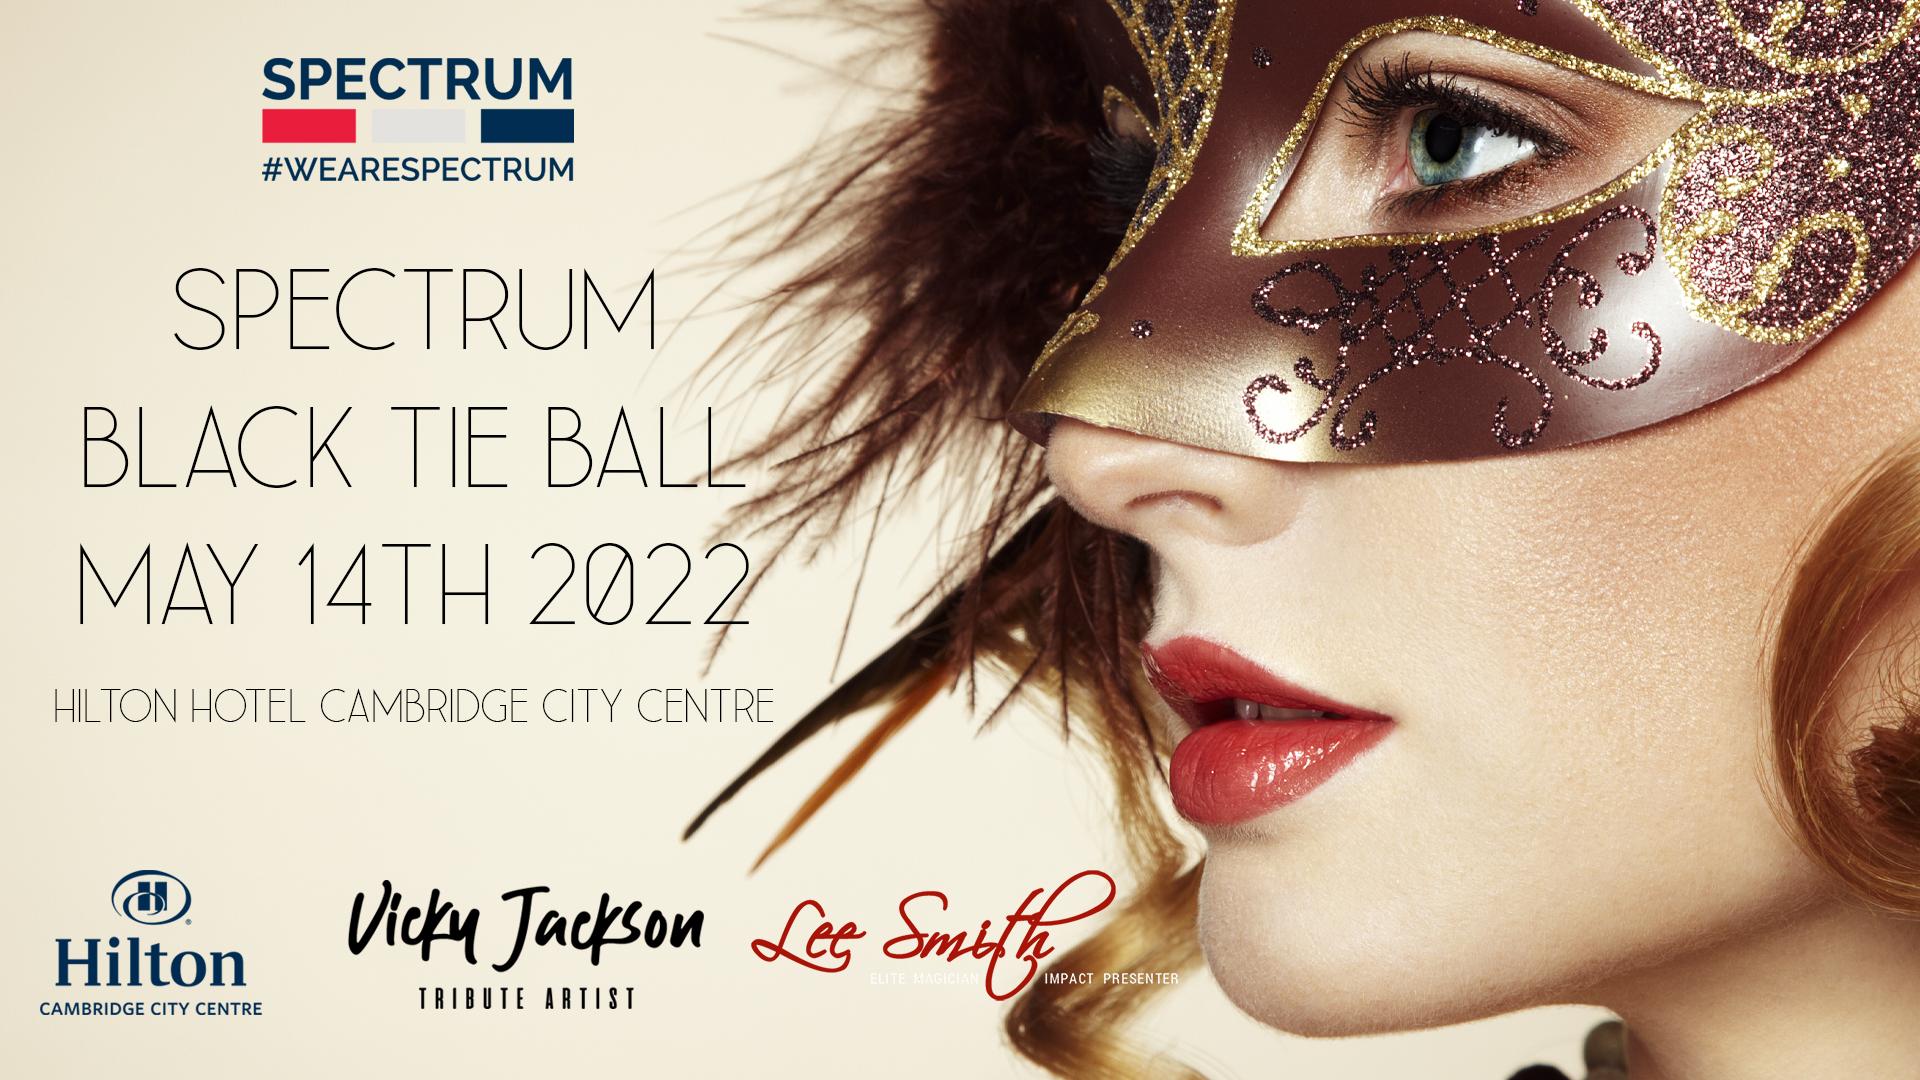 Spectrum Black Tie Ball 2022